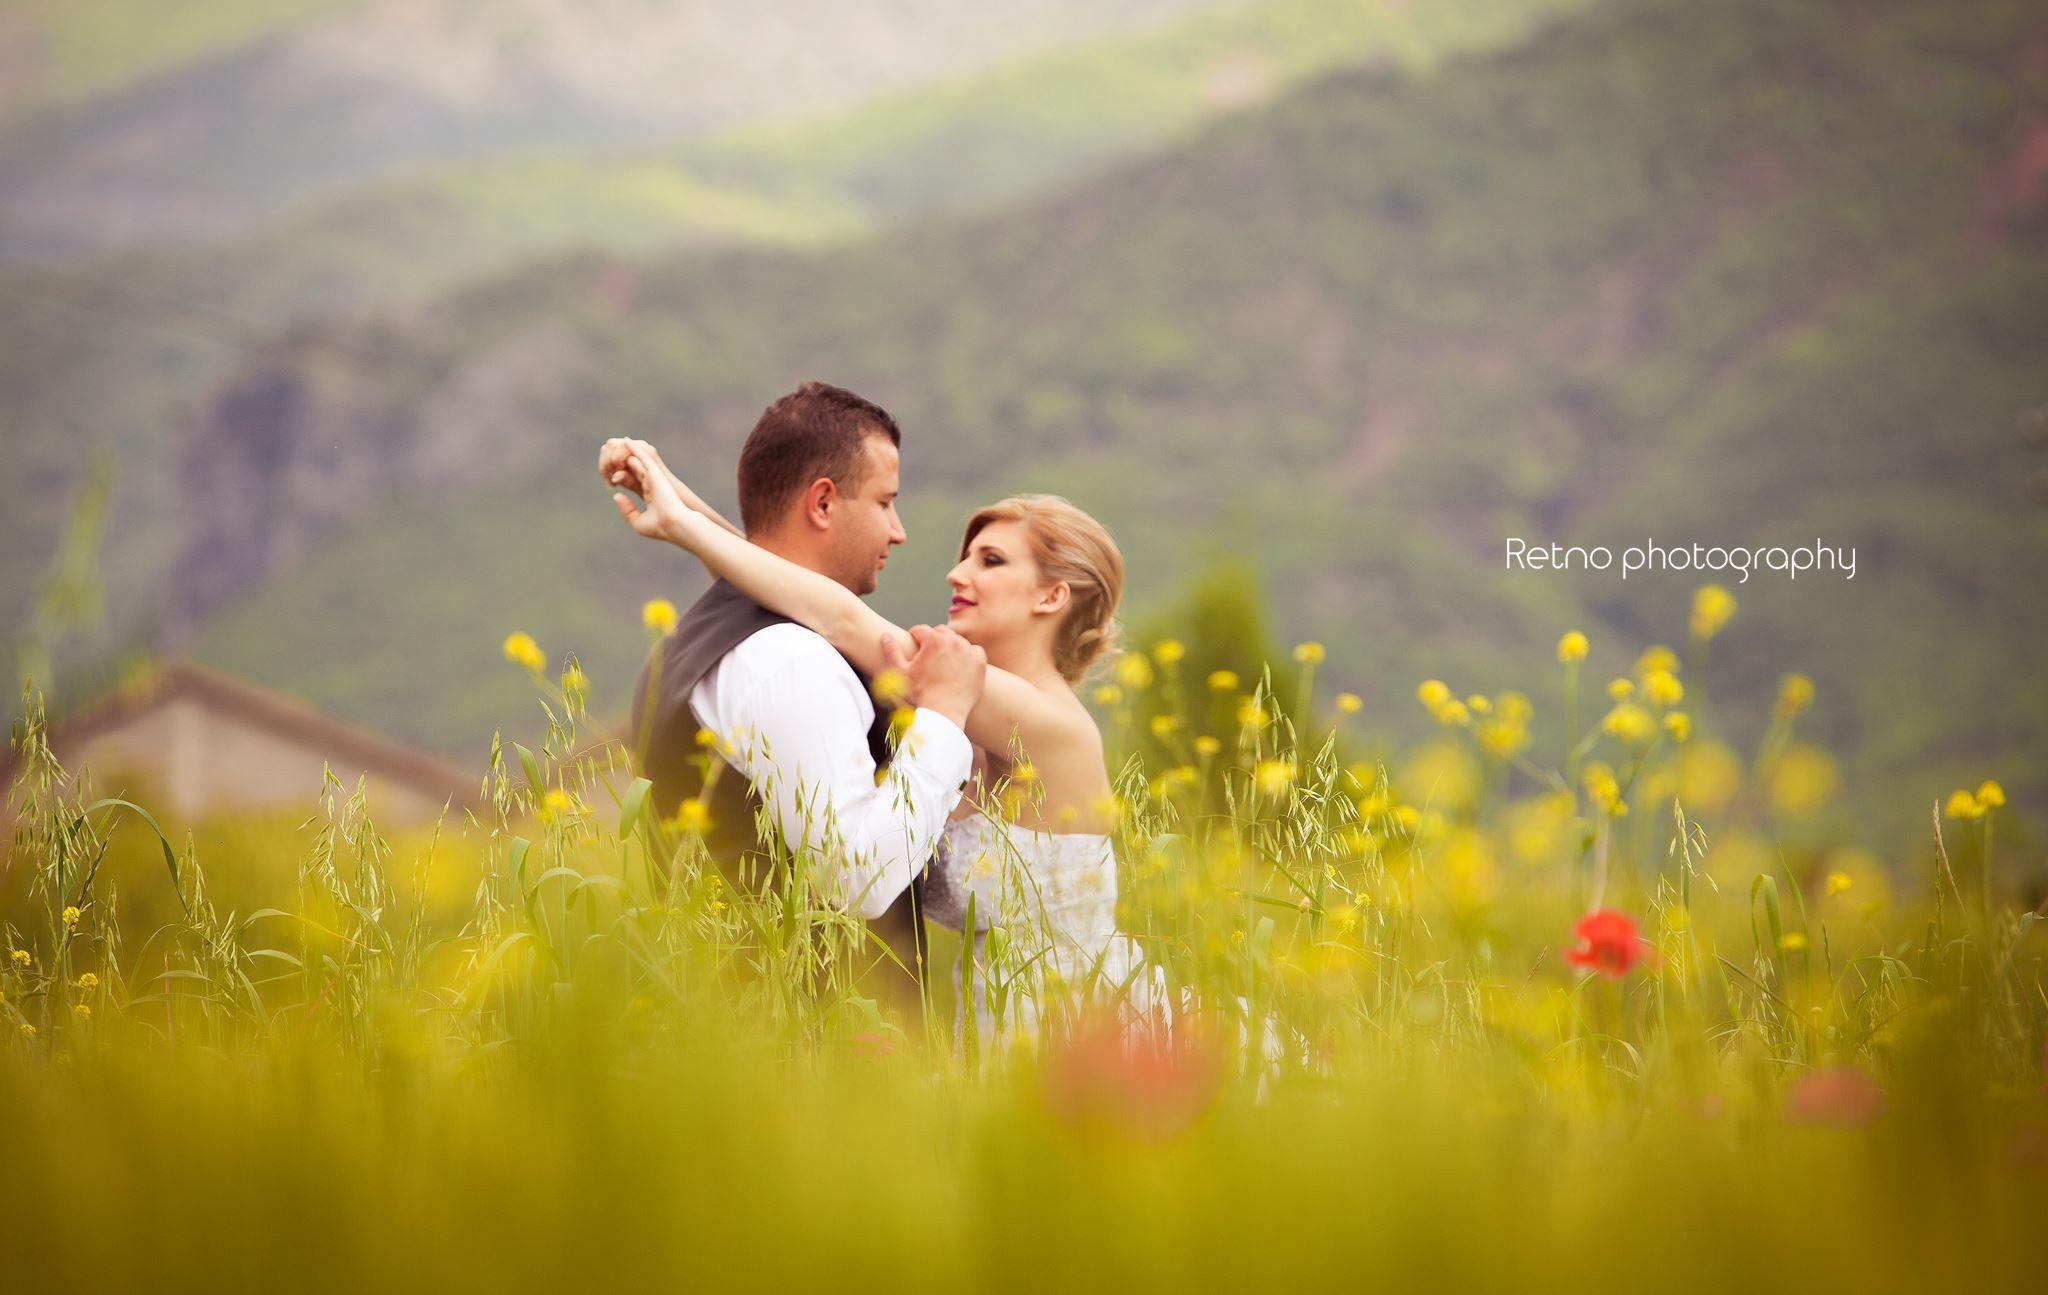 Retno Photography by Rexhino Qosja